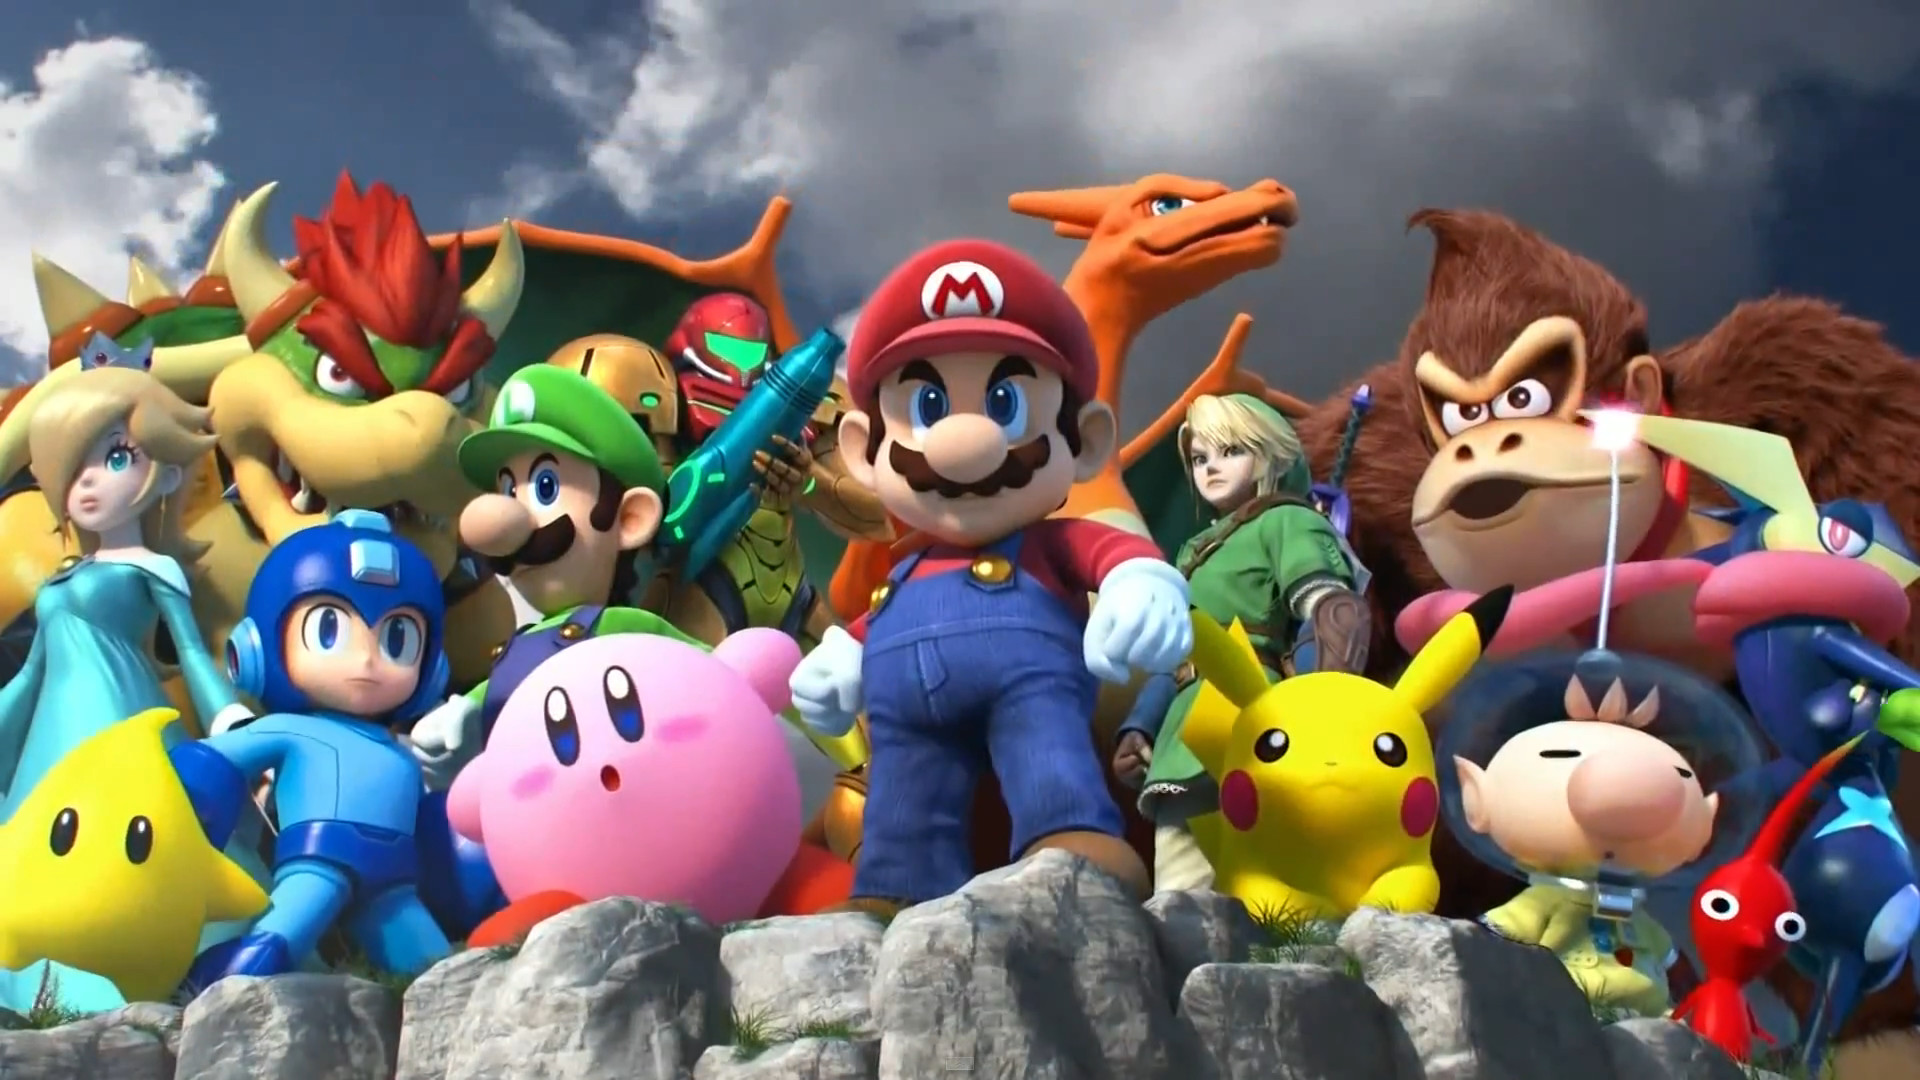 Super Smash Brothers Wallpaper (75+ images)